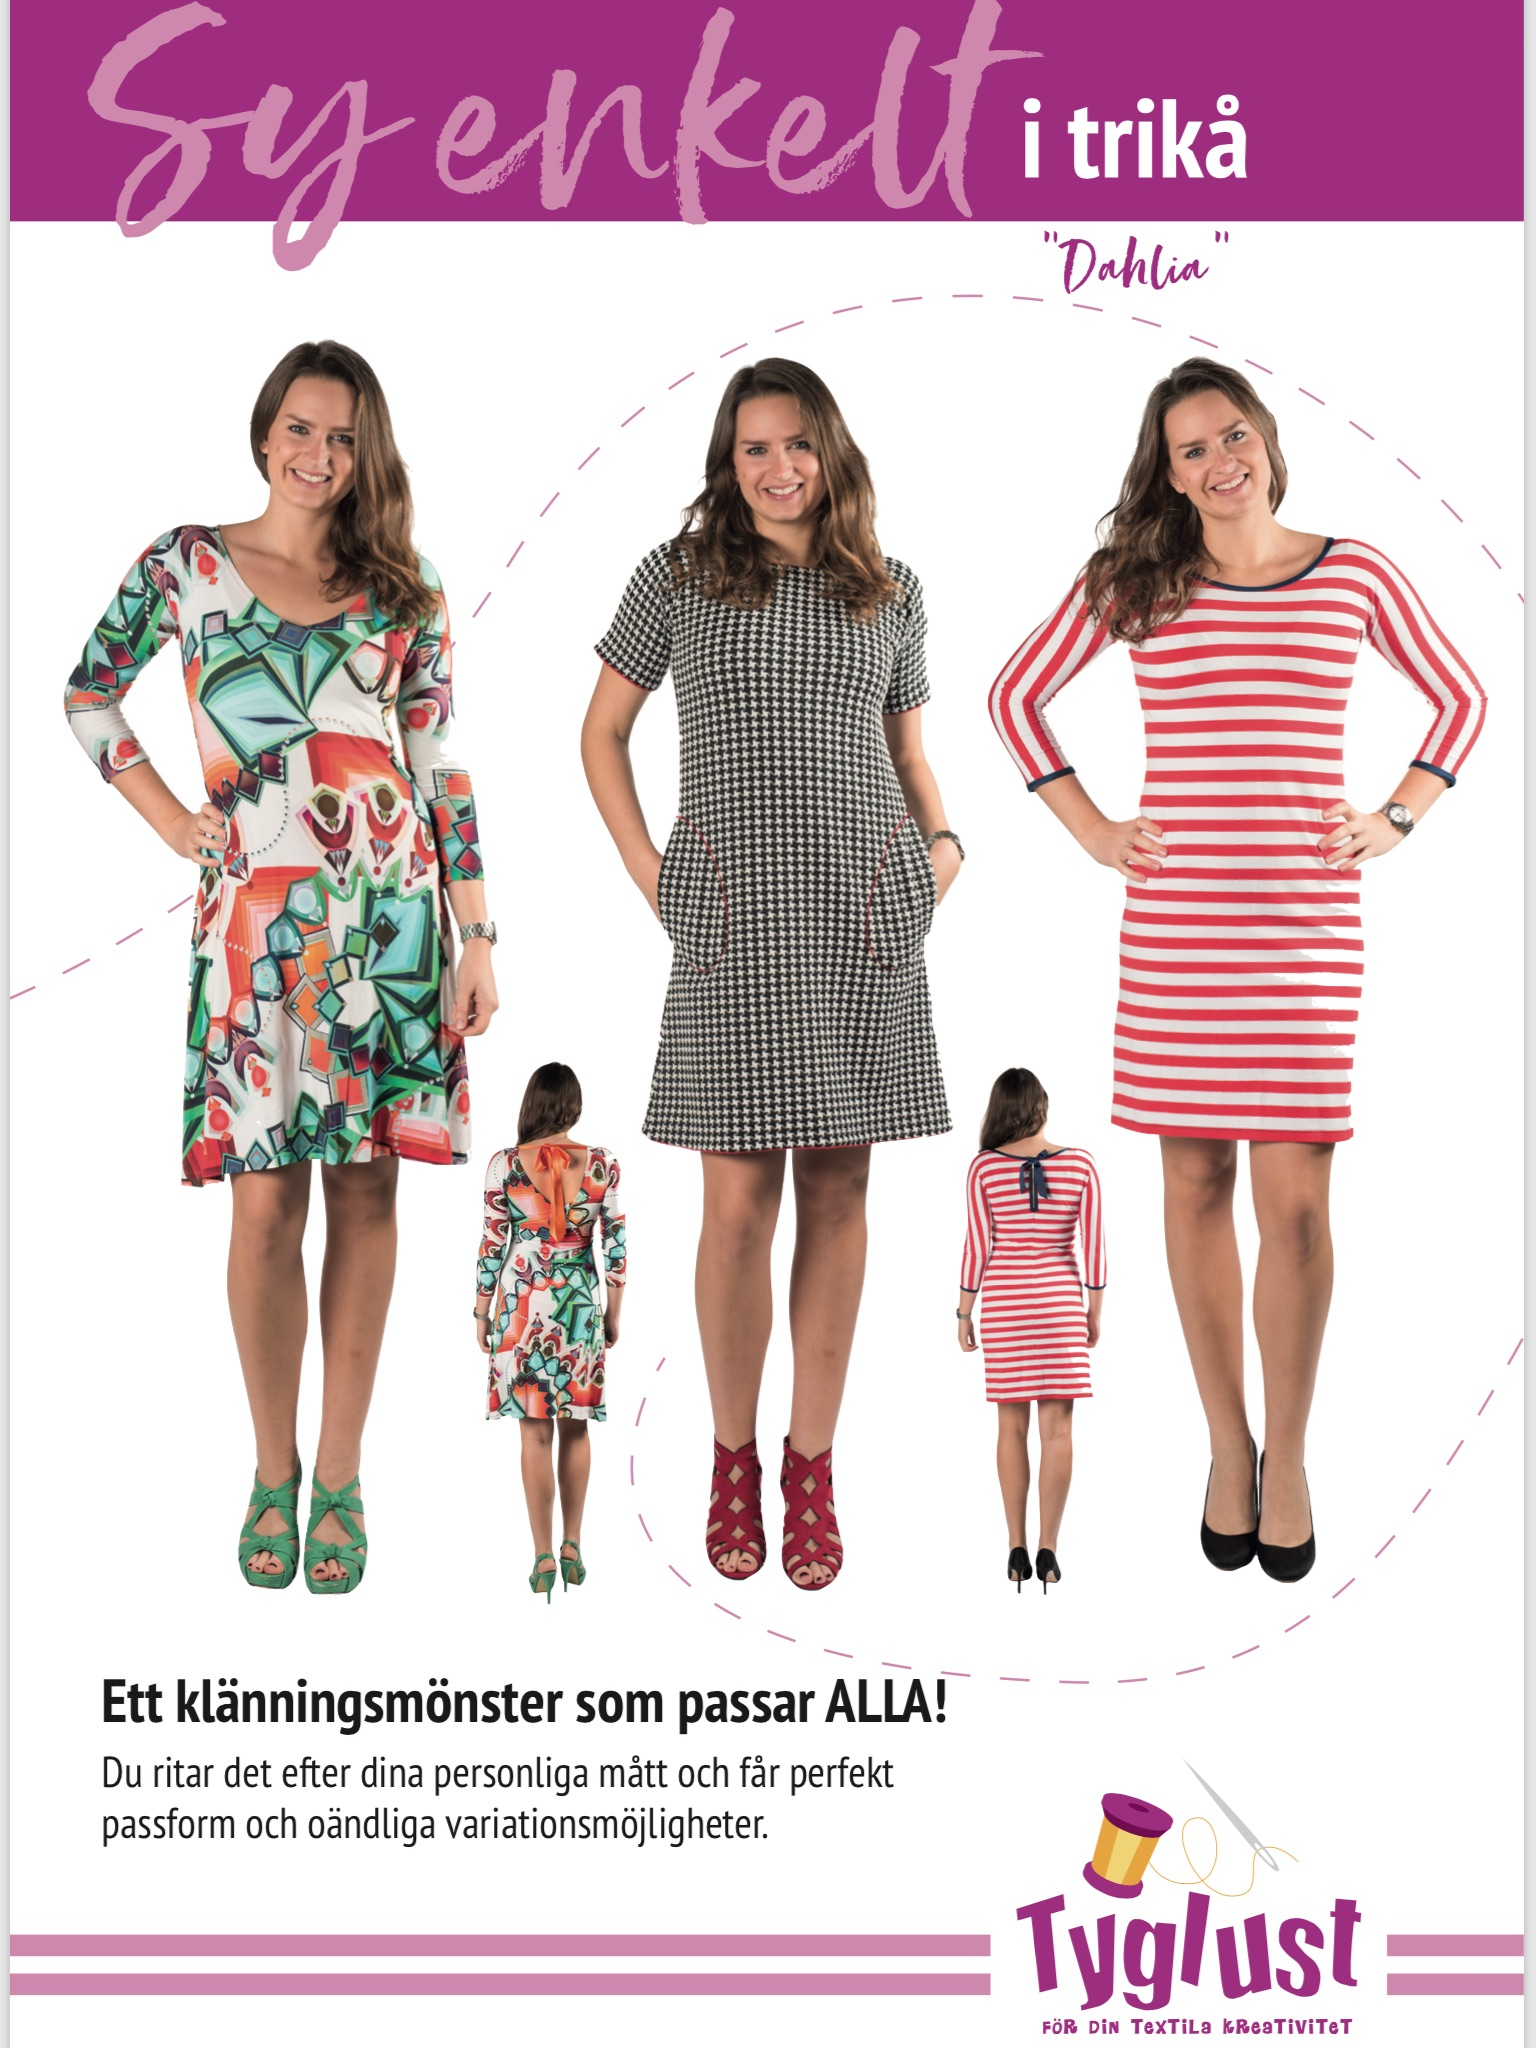 sy enkelt i trikå klänning tunika dahlia Tyglust mönster design